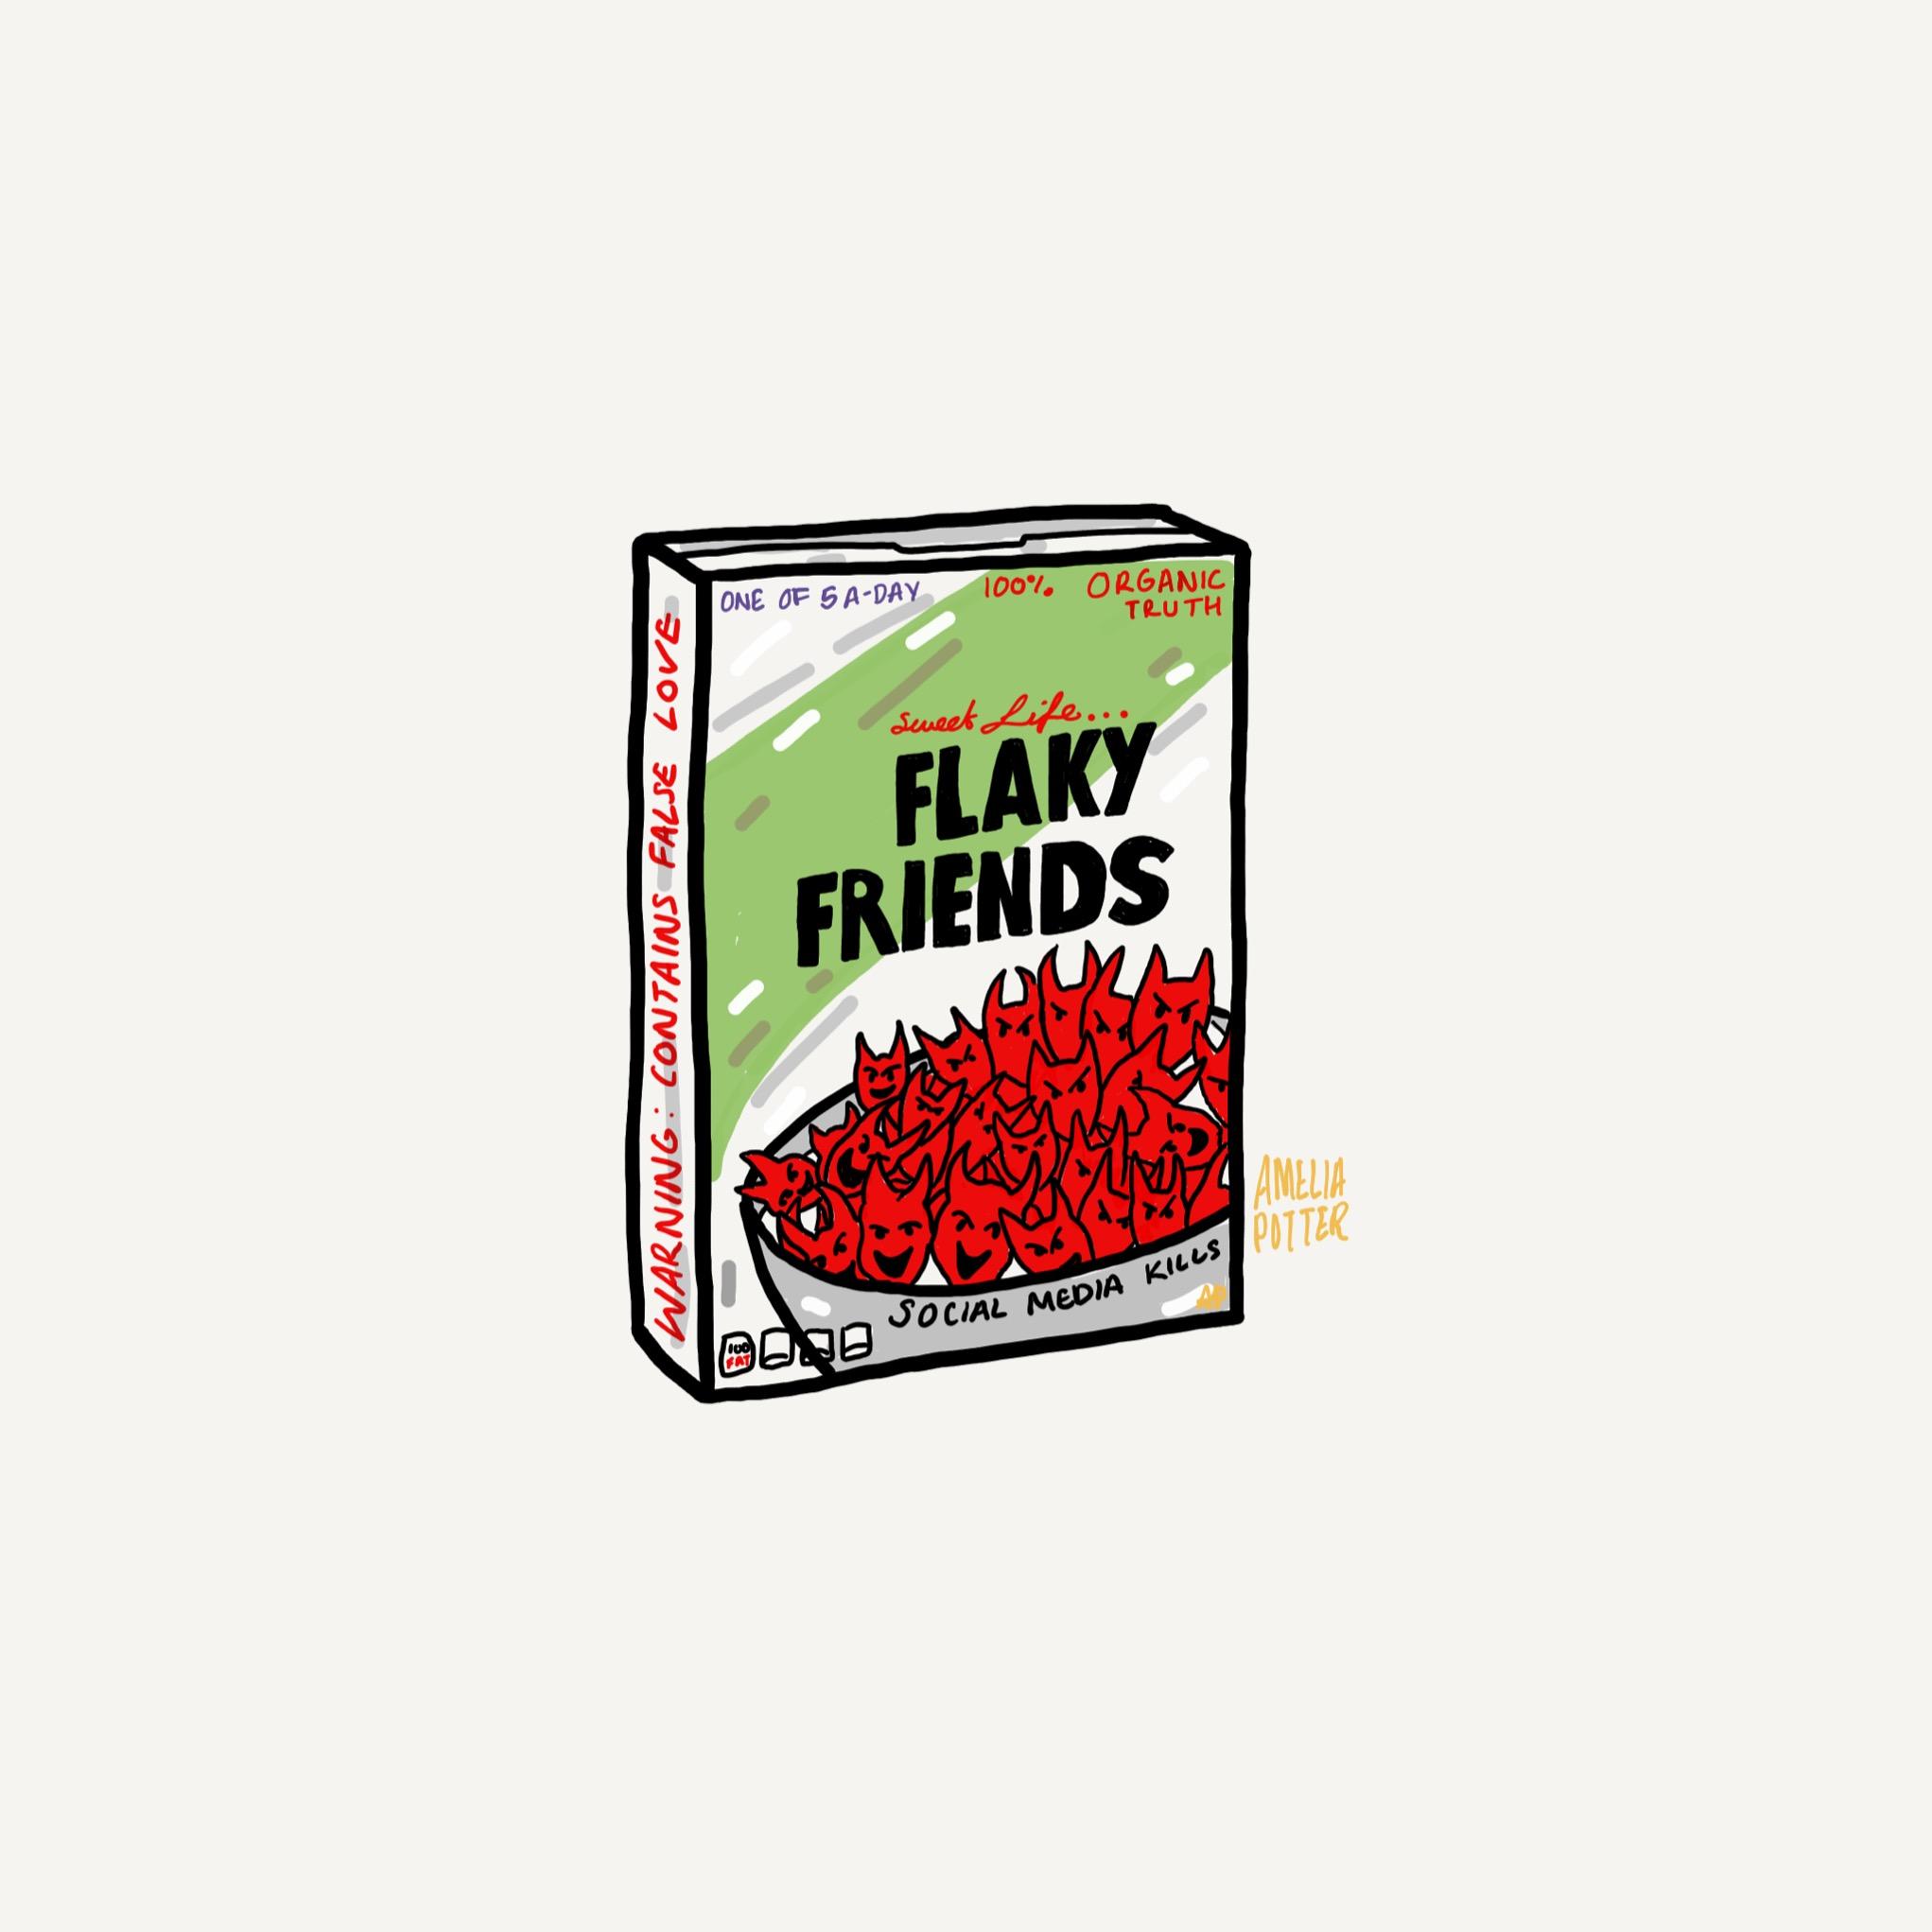 Flaky Freinds